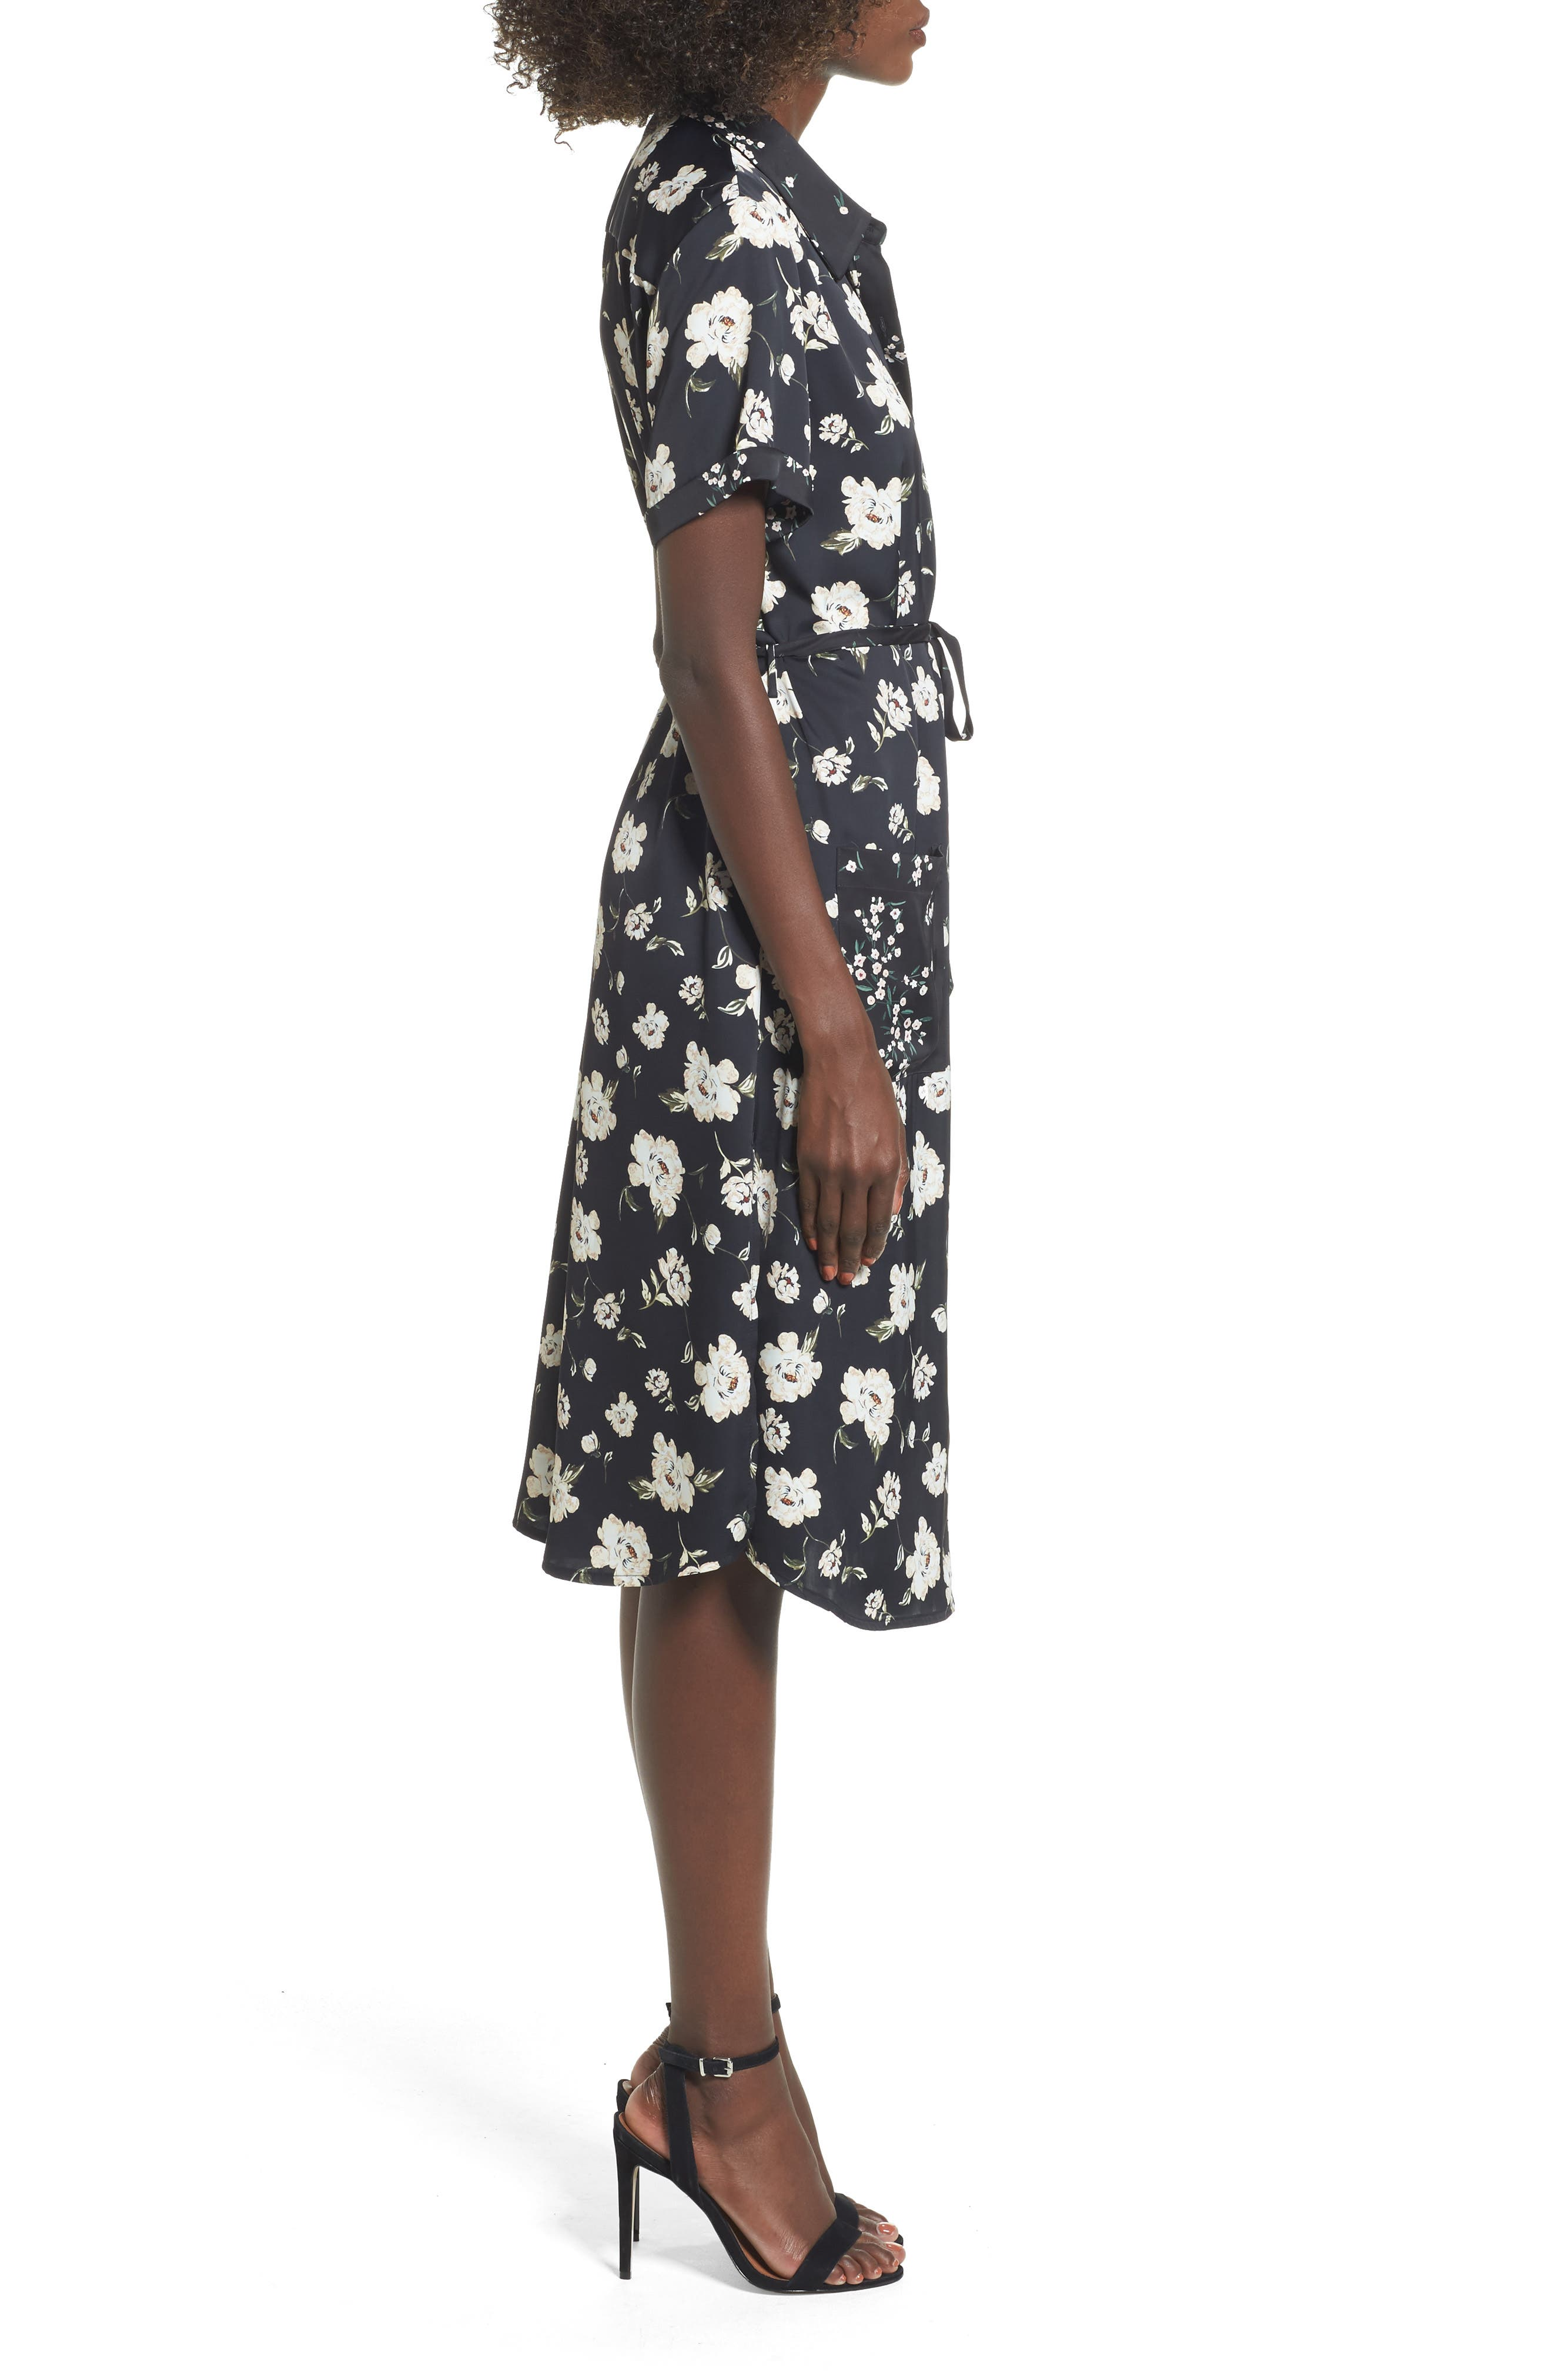 L'Academie The Shirt Dress Midi Dress,                             Alternate thumbnail 3, color,                             001